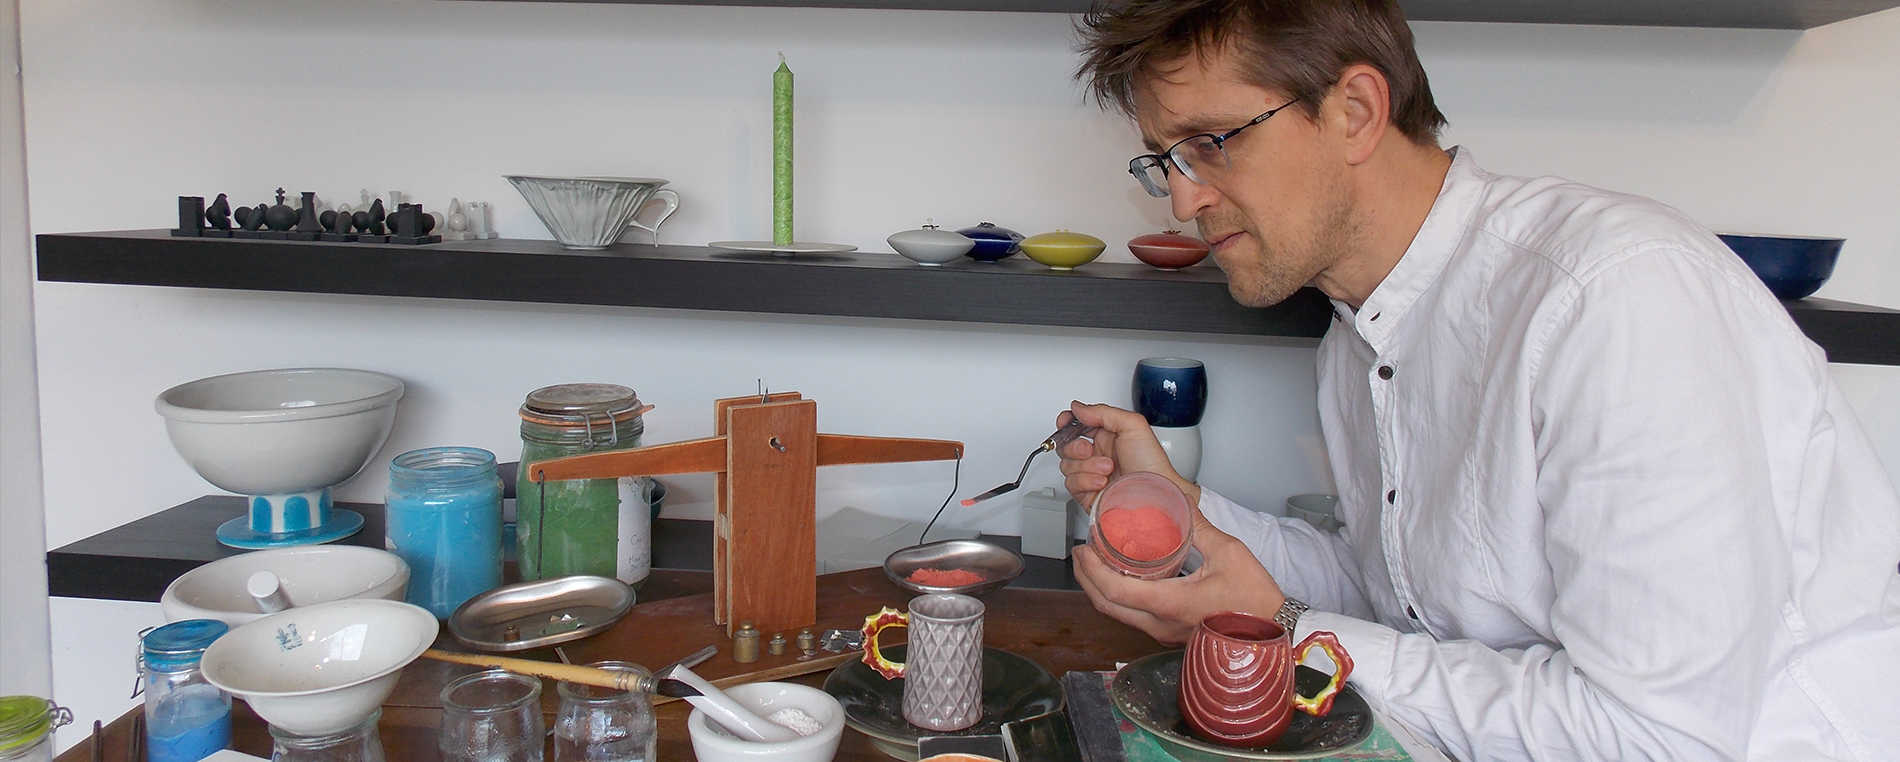 Bas van Zuijlen, designer et céramiste